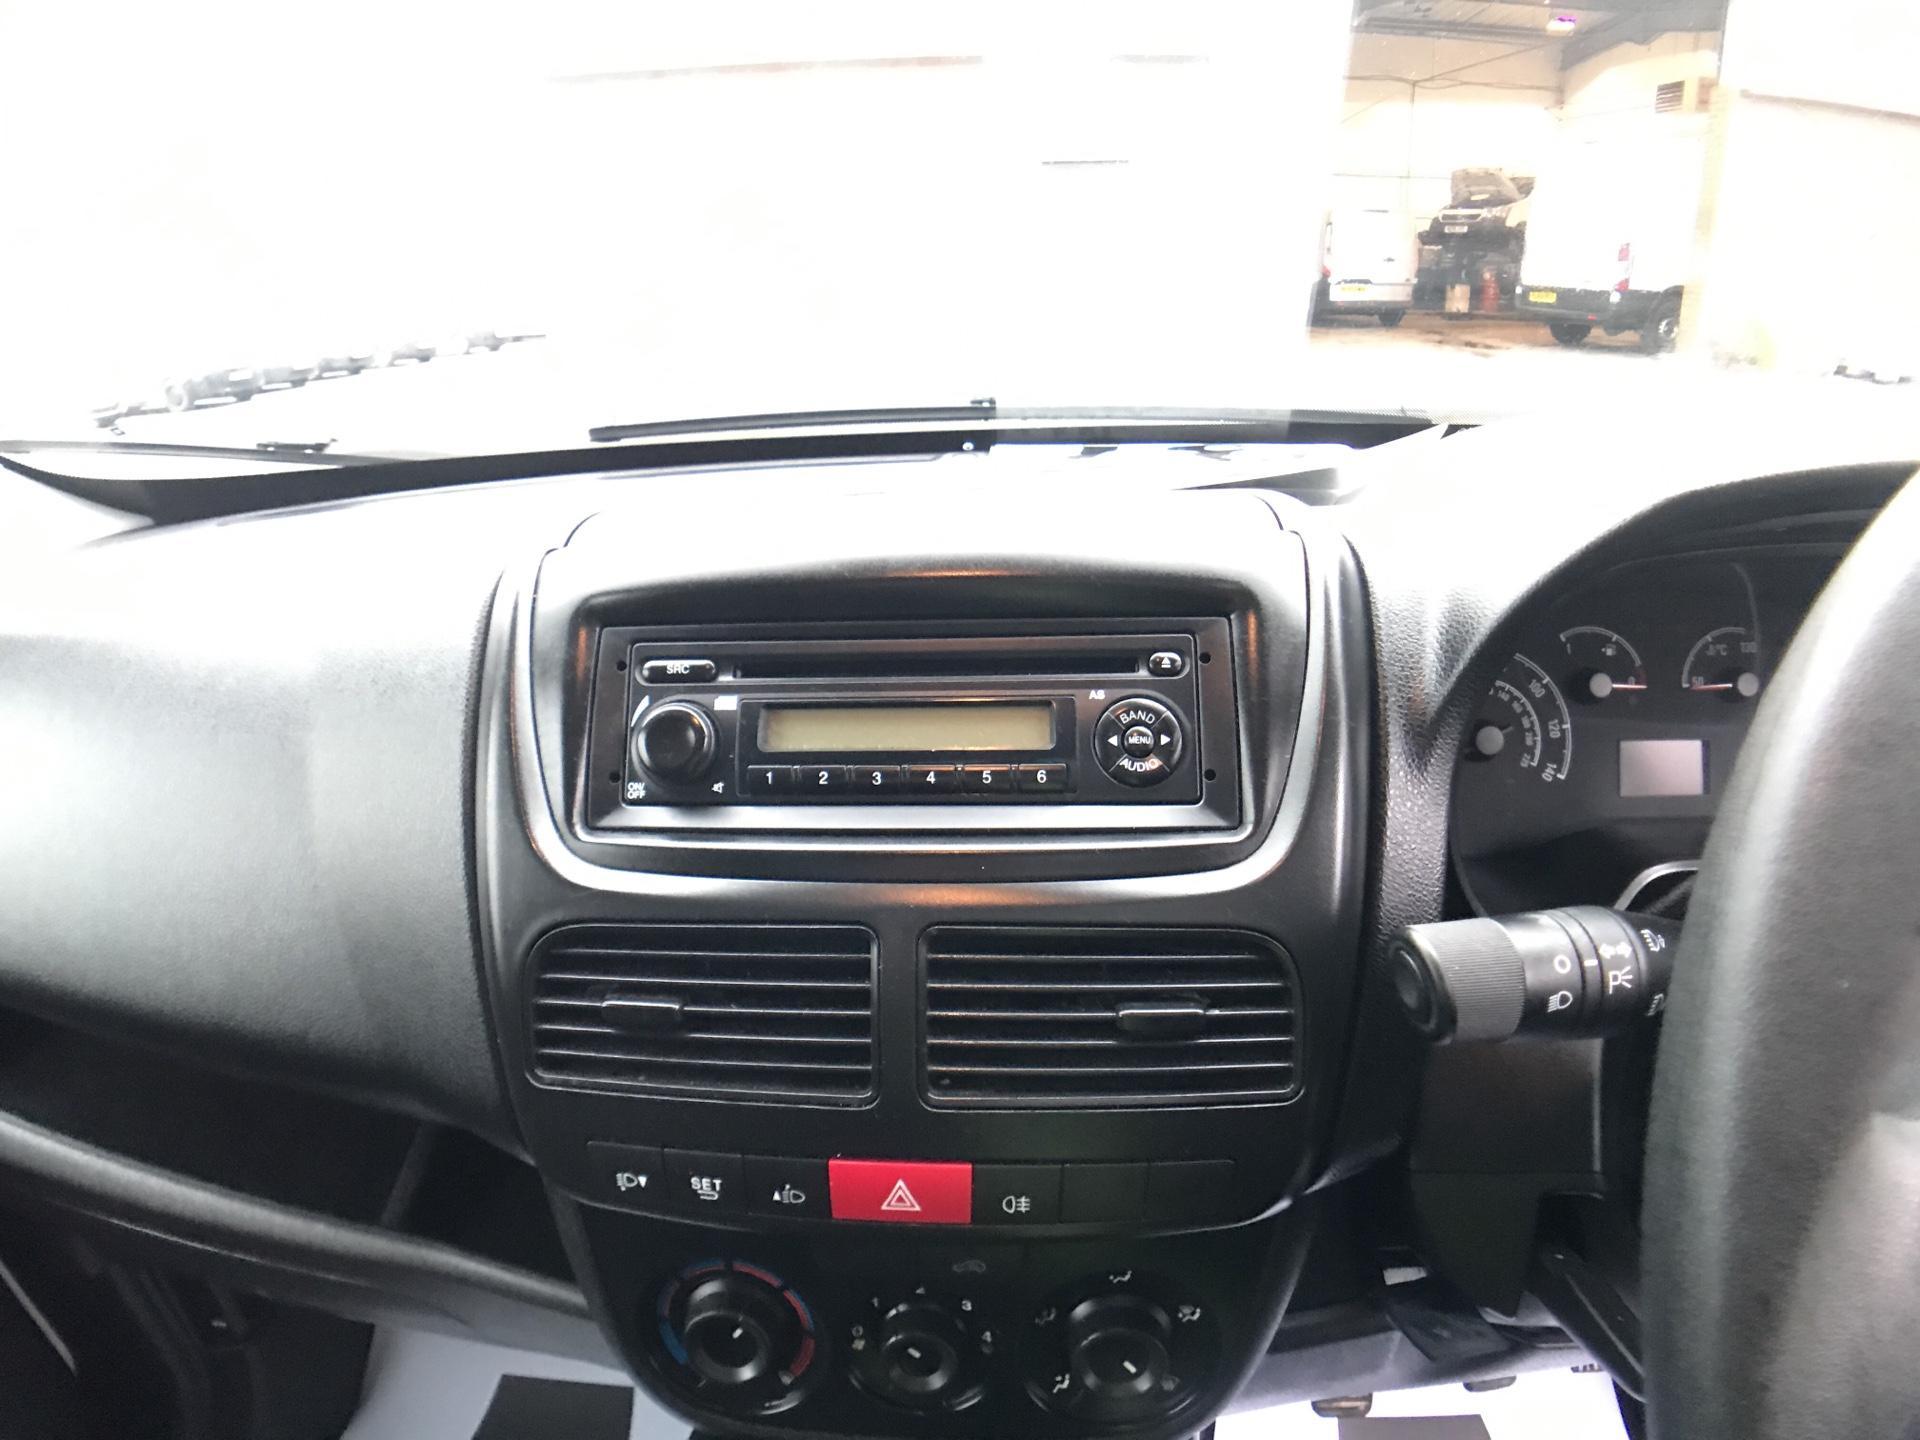 2015 Vauxhall Combo L1 H1 2000 1.3 16V  EURO 5 (DX65UEJ) Image 10